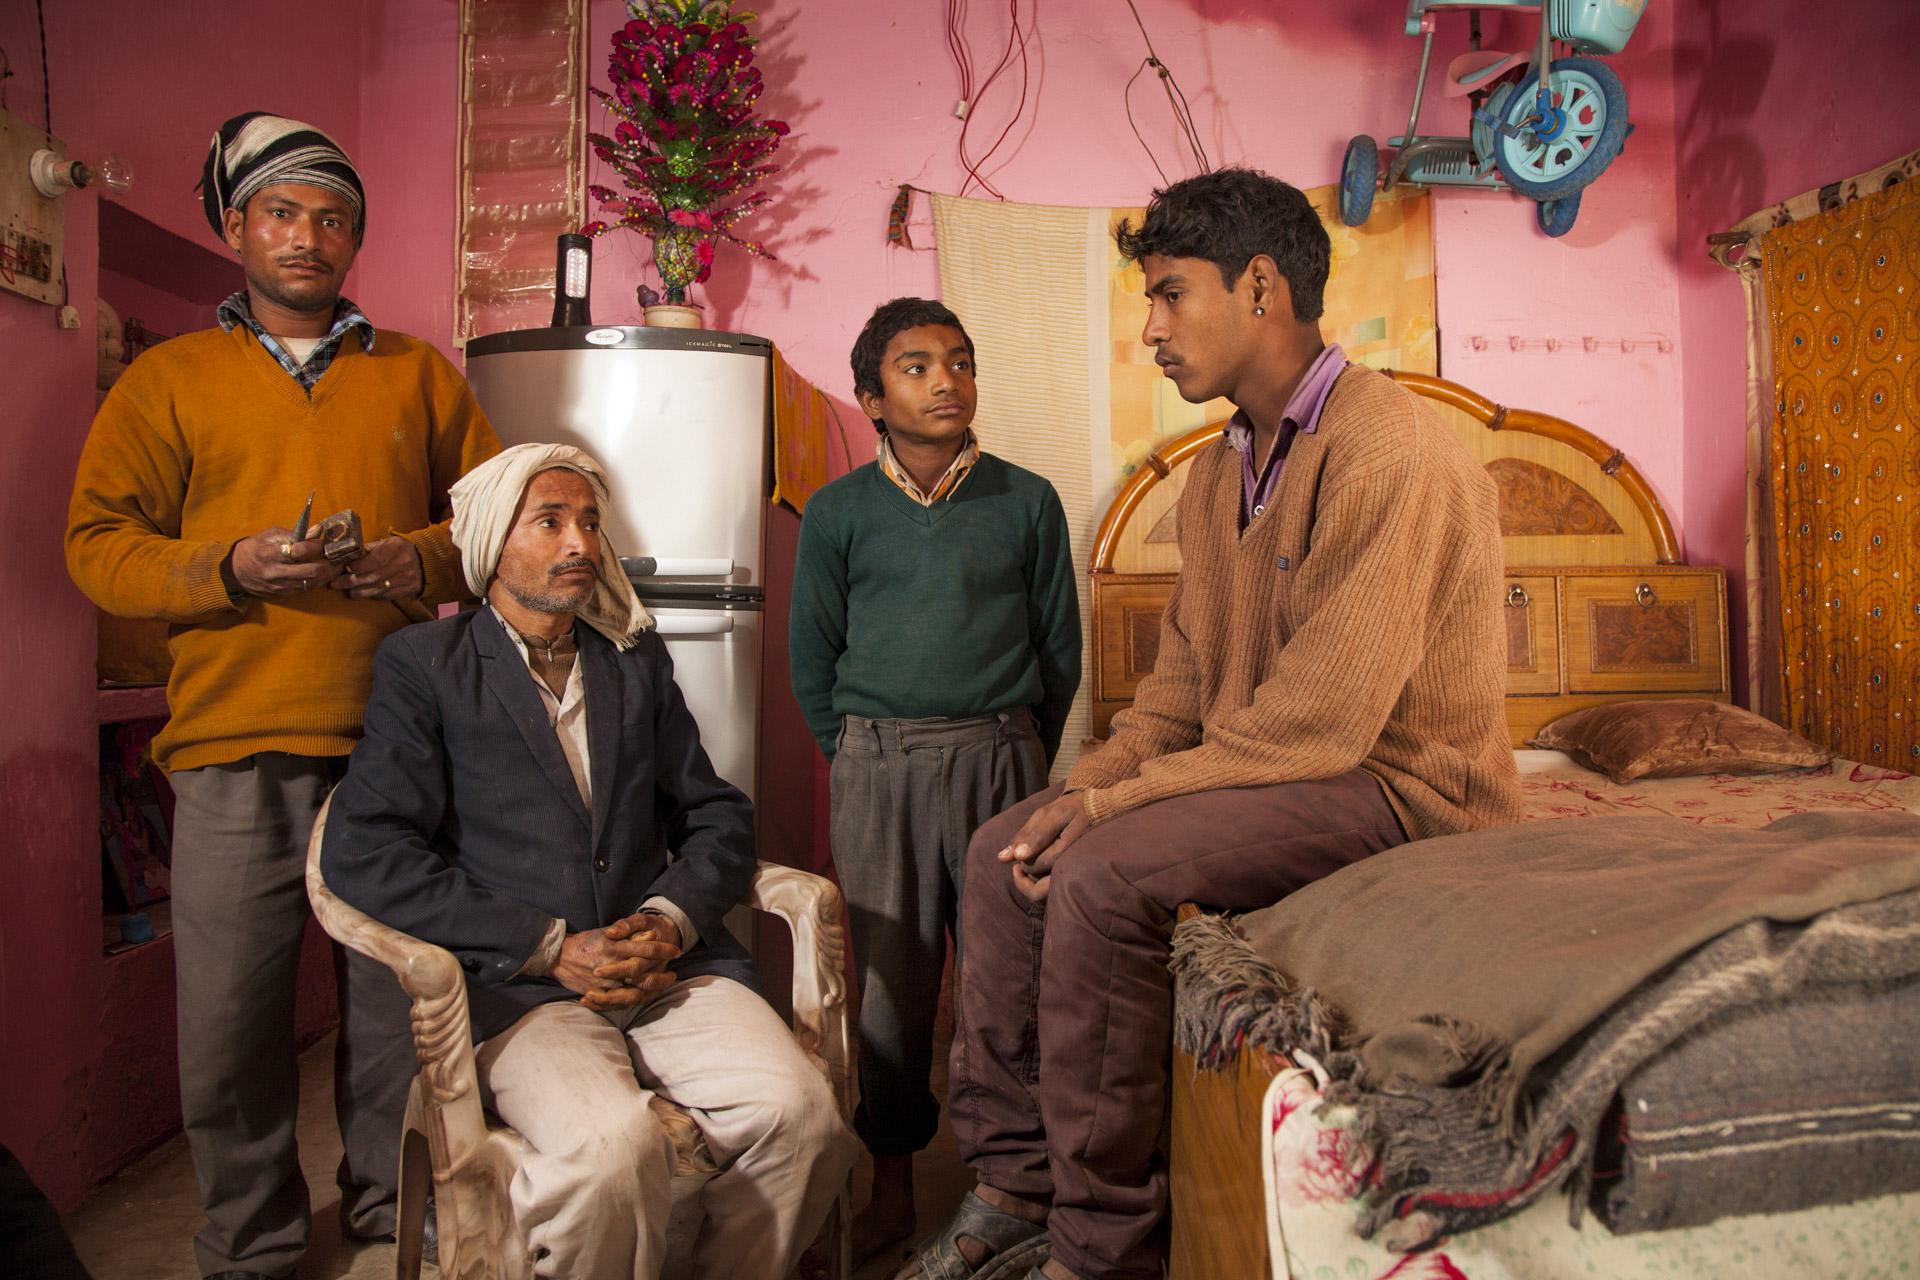 Madhupur Village near Agra, Uttar Pradesh, India.Harish and his family.Mahender, his father Daudayal, Luekush (12) and Harish in Mahender and Ruby's beautiful bedroom.